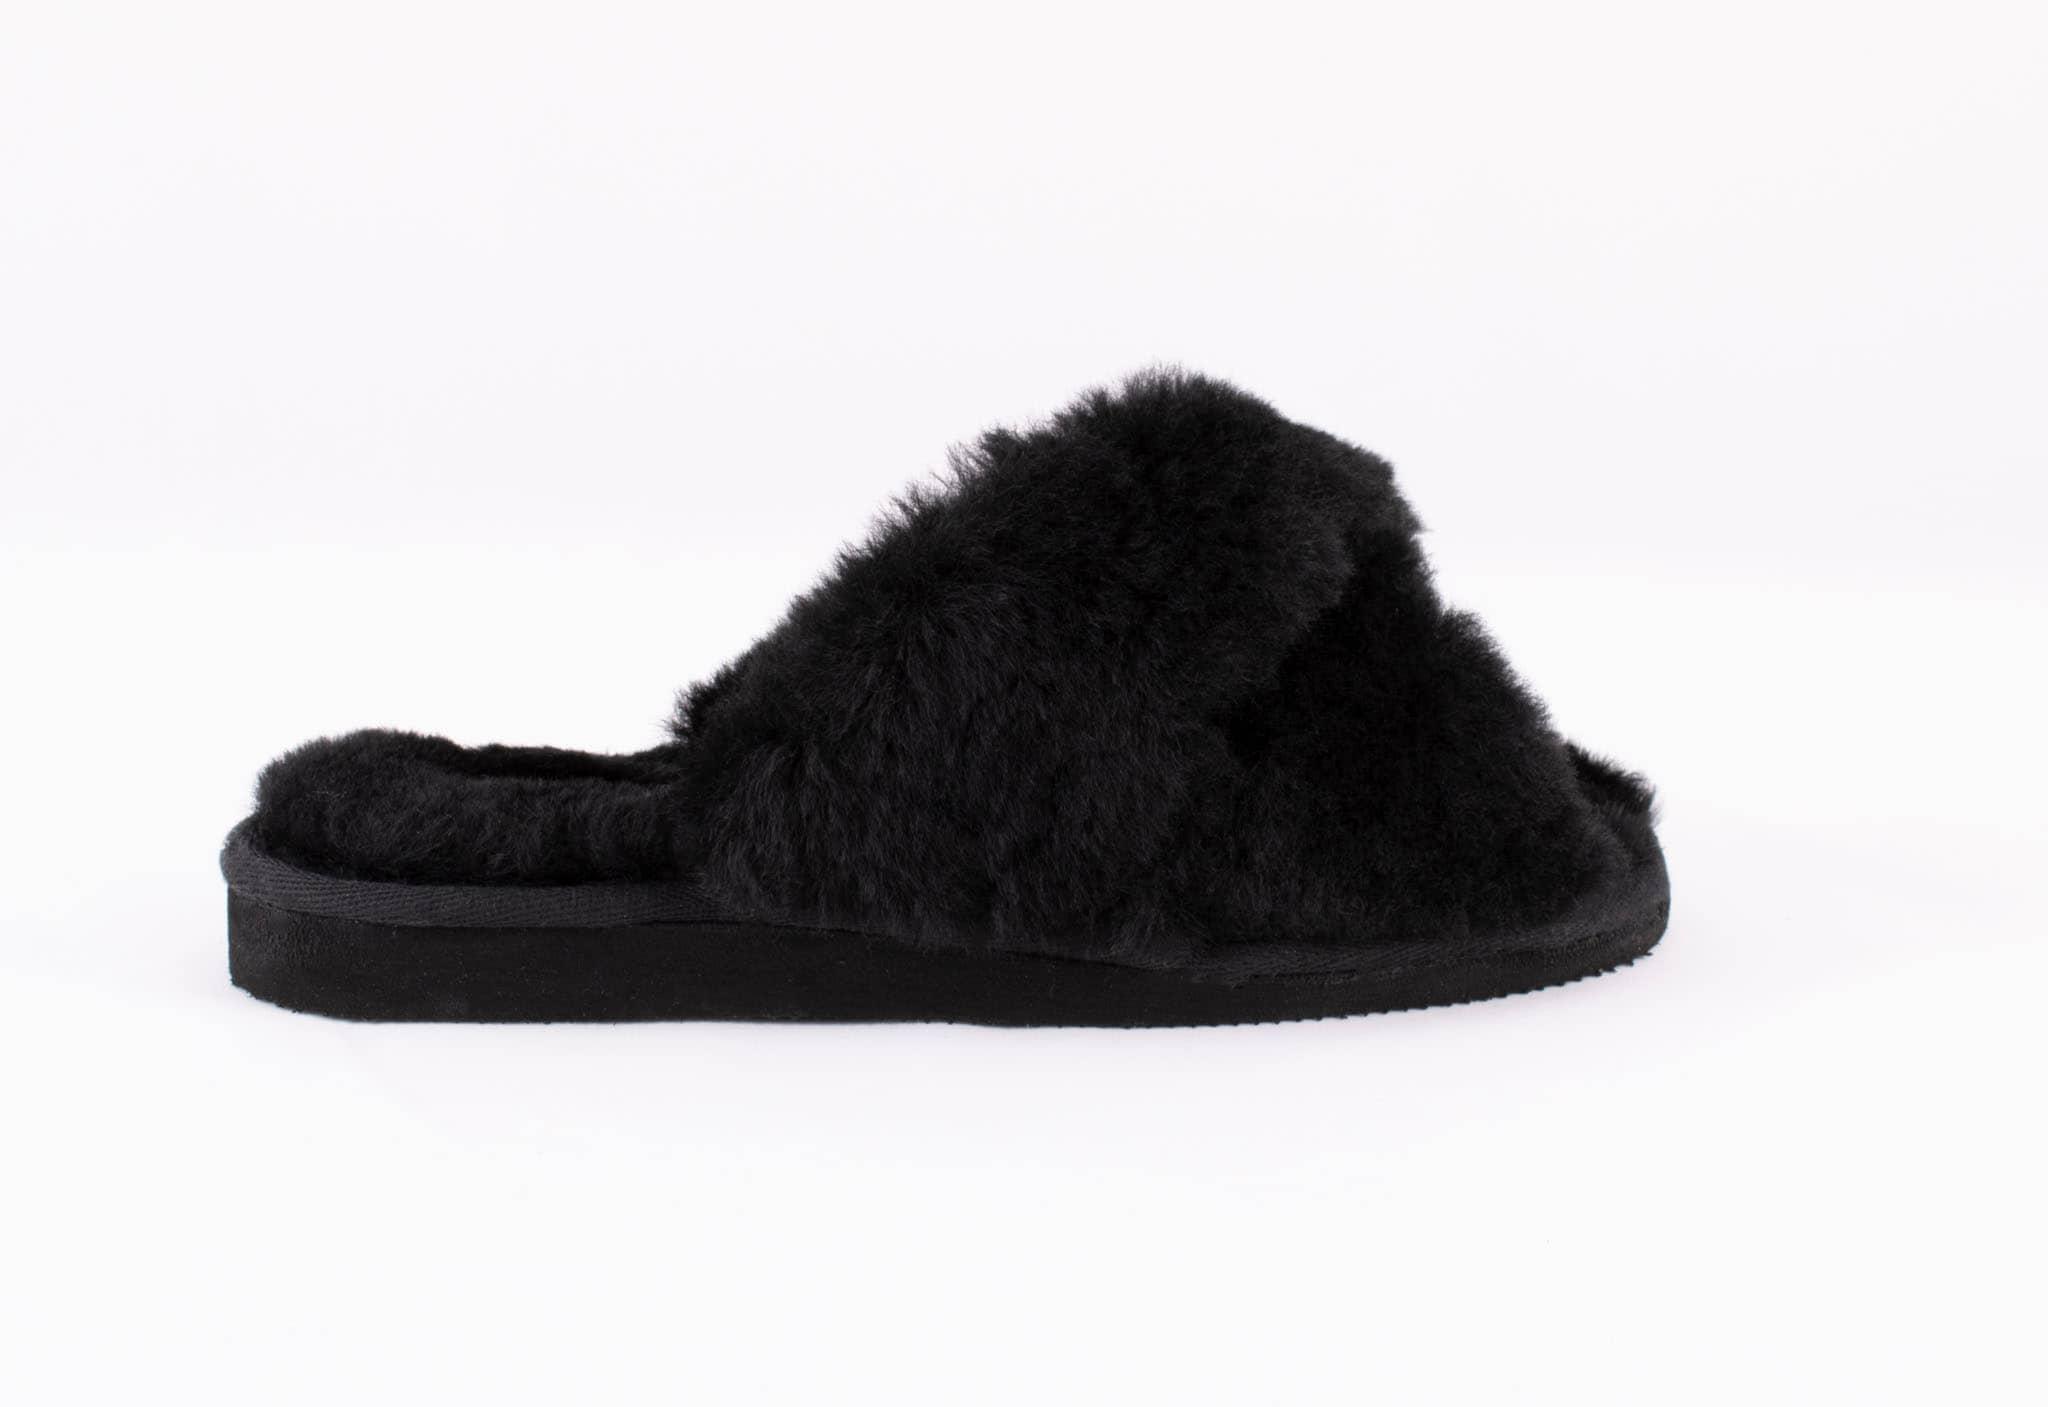 Lovisa sheepskin slippers